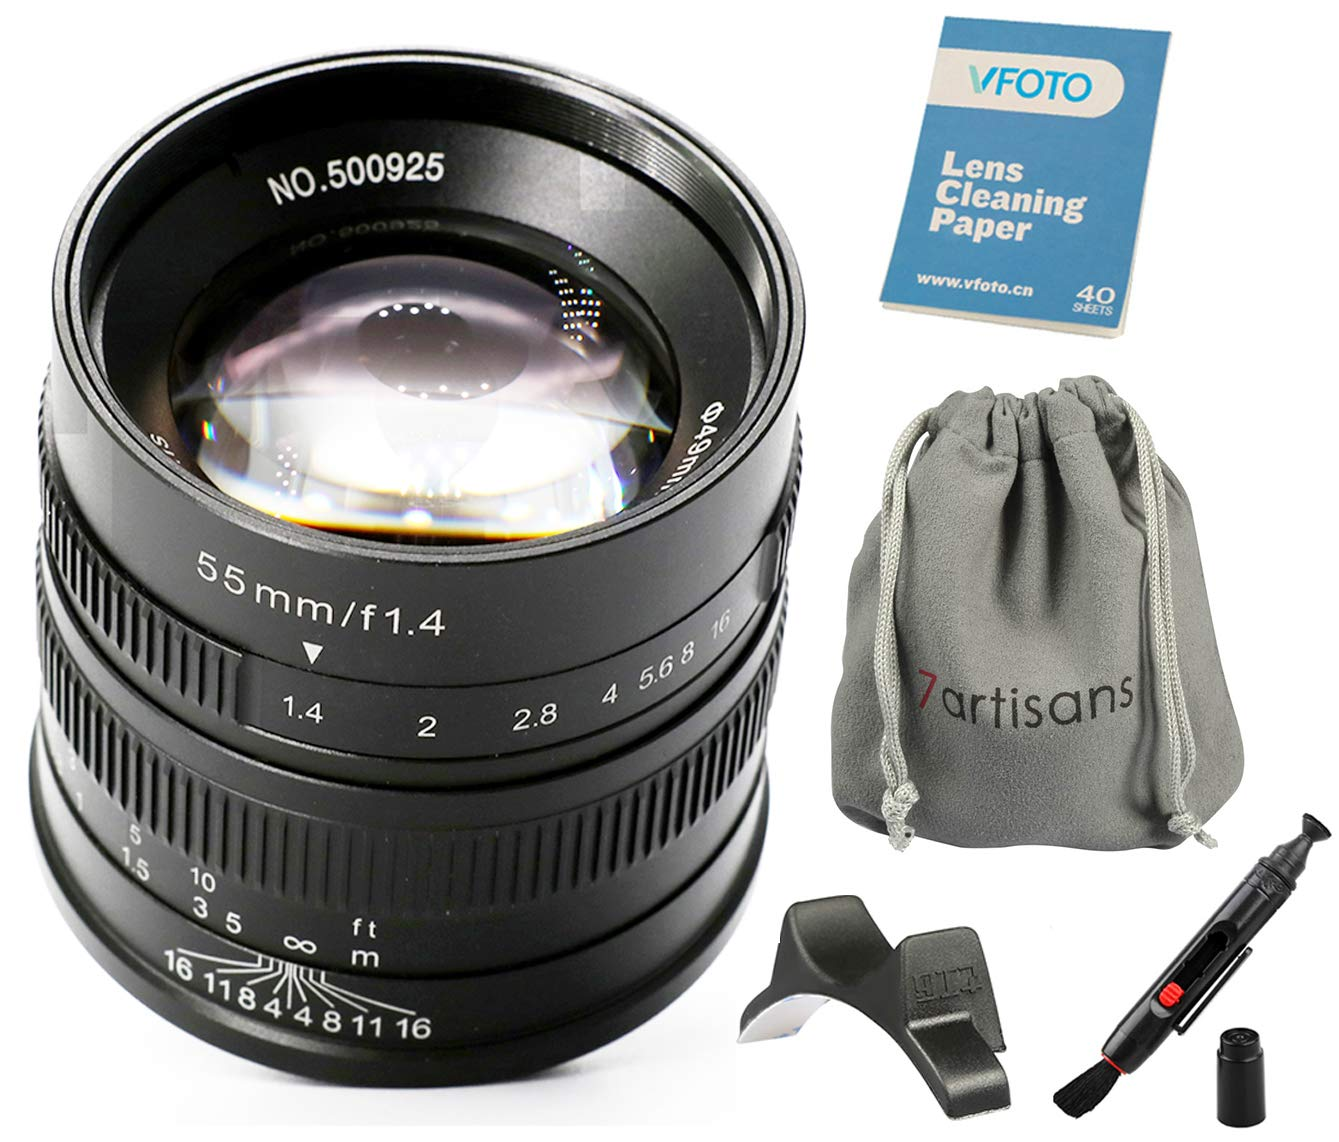 Nwv Direct Micro Fiber Cleaning Cloth for Canon VIXIA HF M500 0.21x-0.22x High Grade Fish-Eye Lens